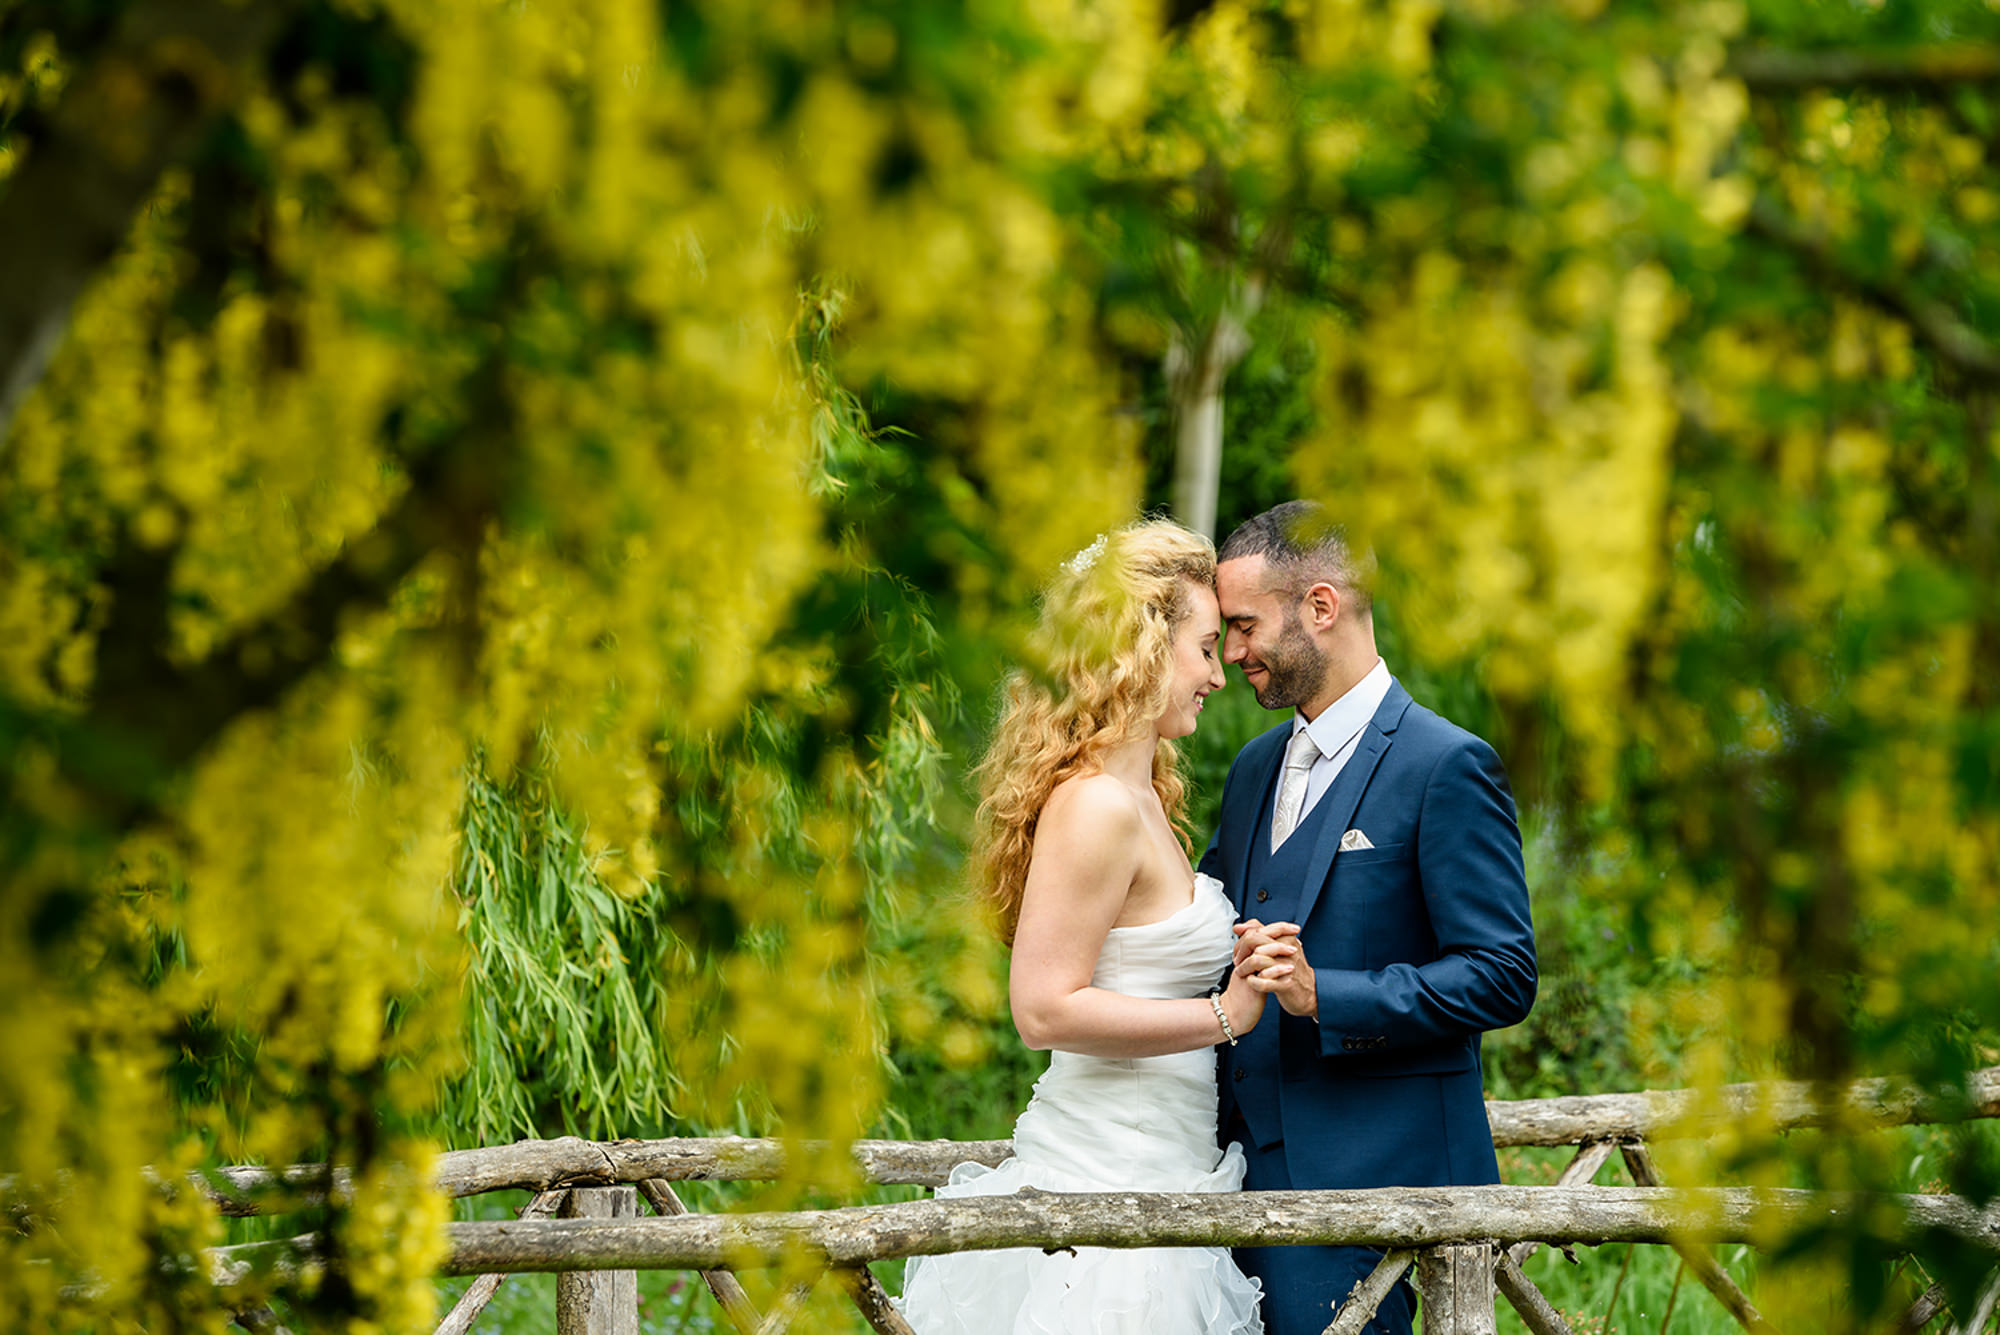 best-wedding-photographer-wiltshire.jpg